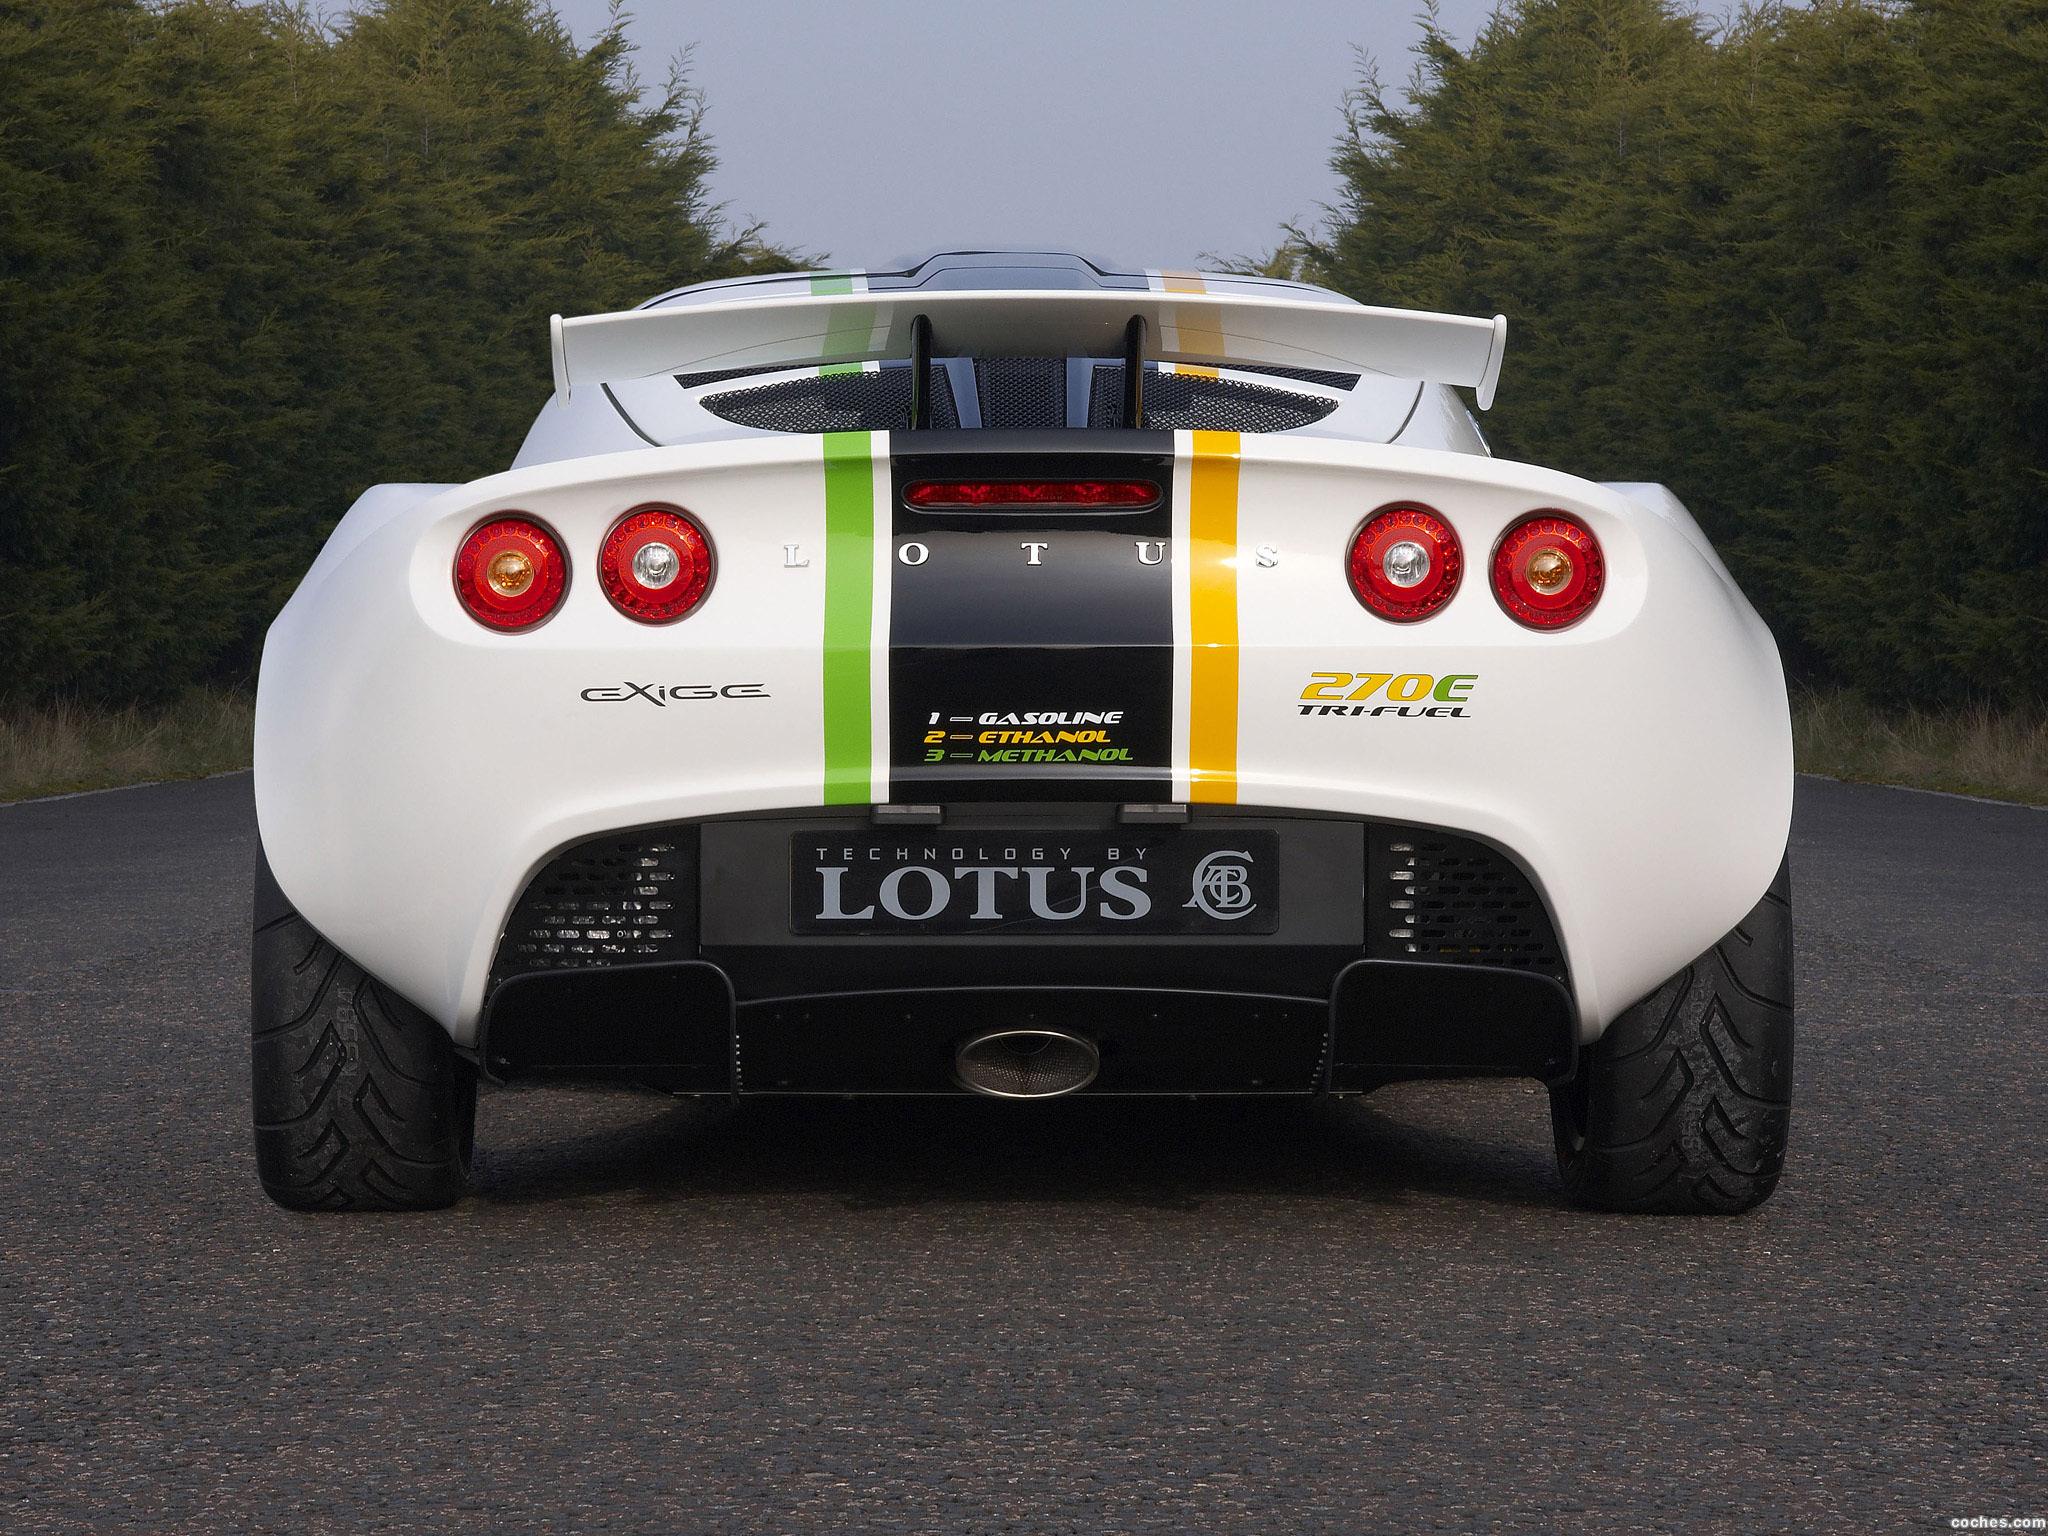 Foto 1 de Lotus Exige 270E TriFuel Concept 2008